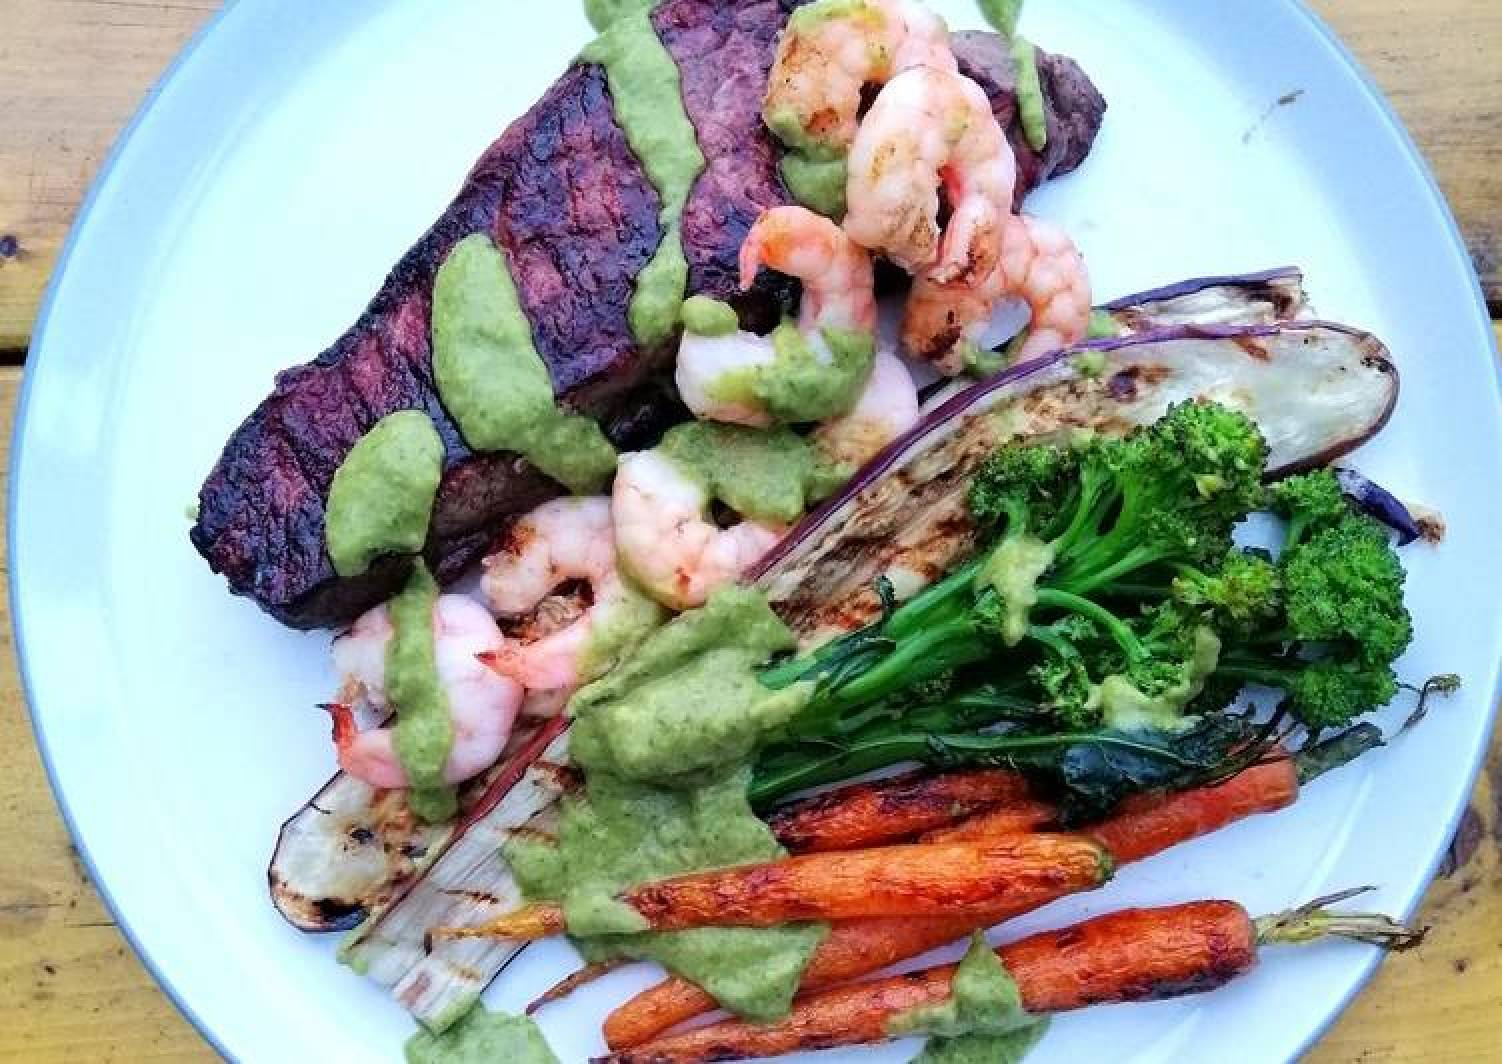 Surf and turf / grilled veg / avocado chimichurri